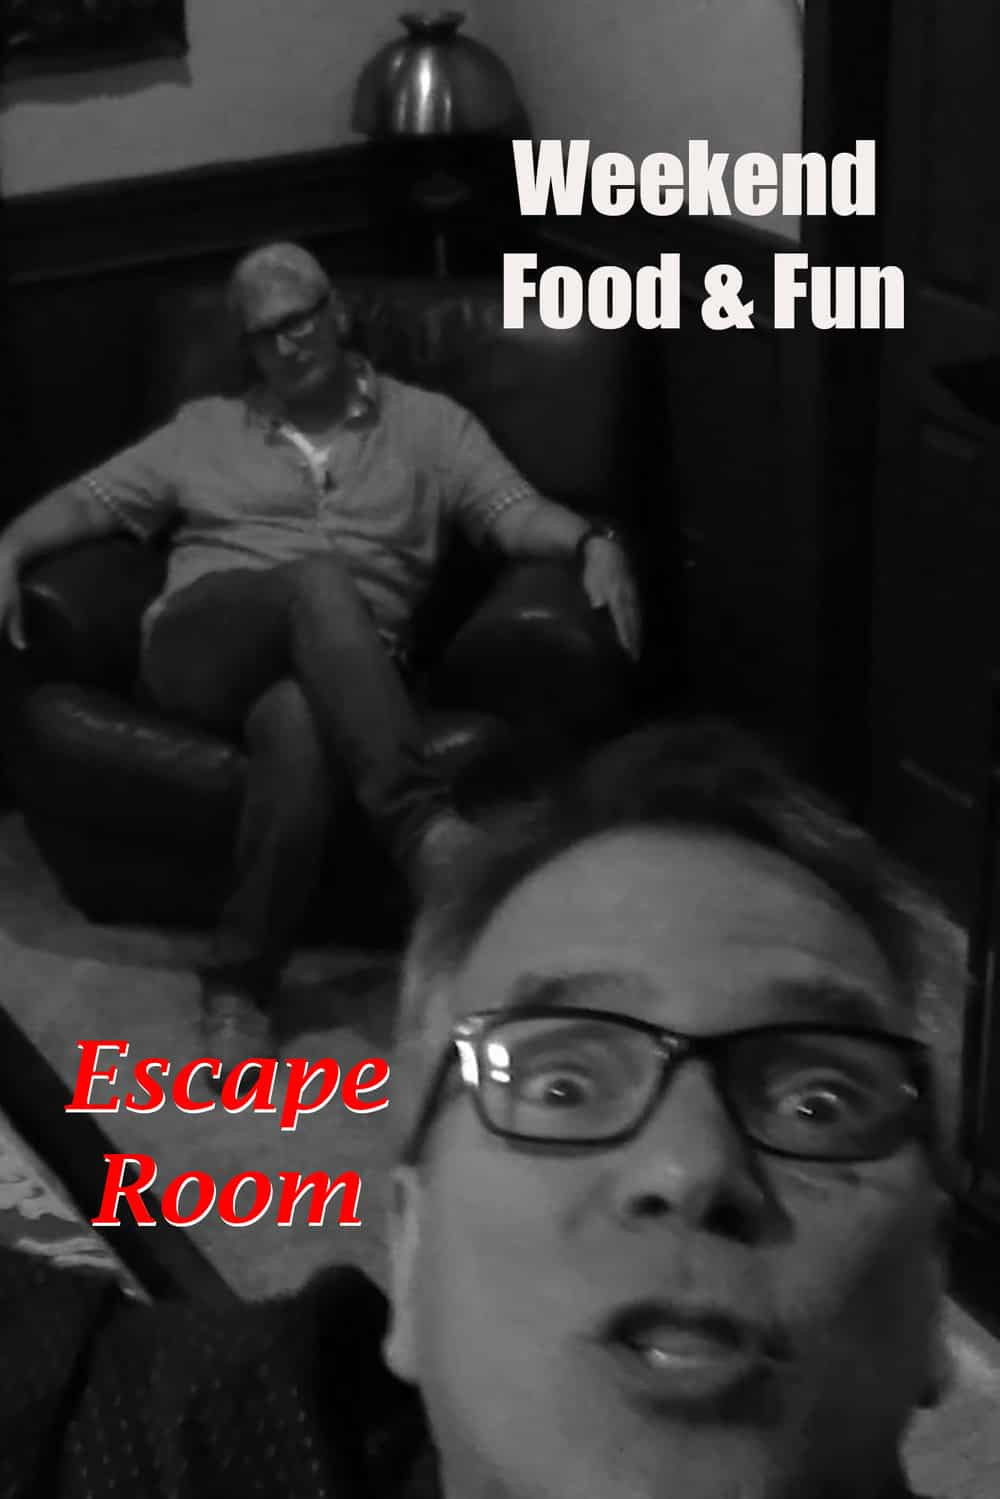 Weekend Food & Fun: Escape Room!